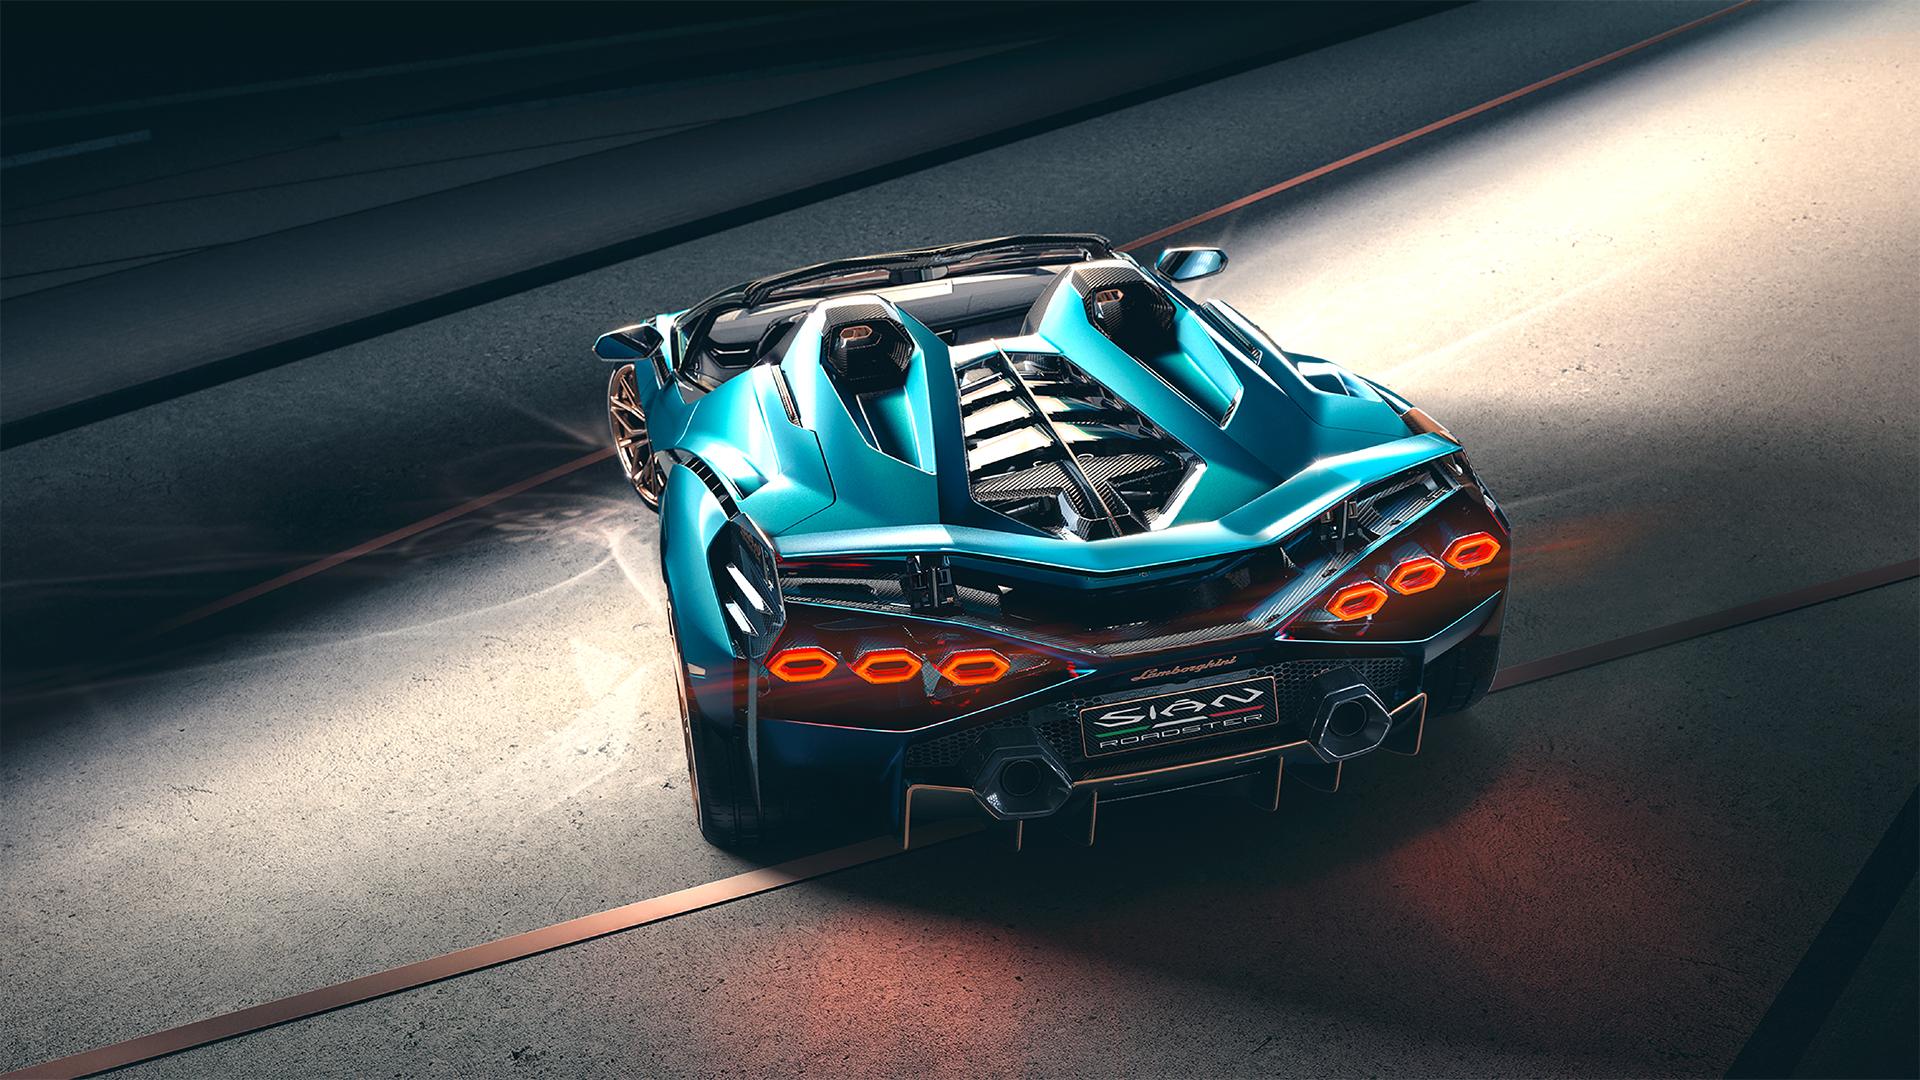 Lamborghini Limited Series